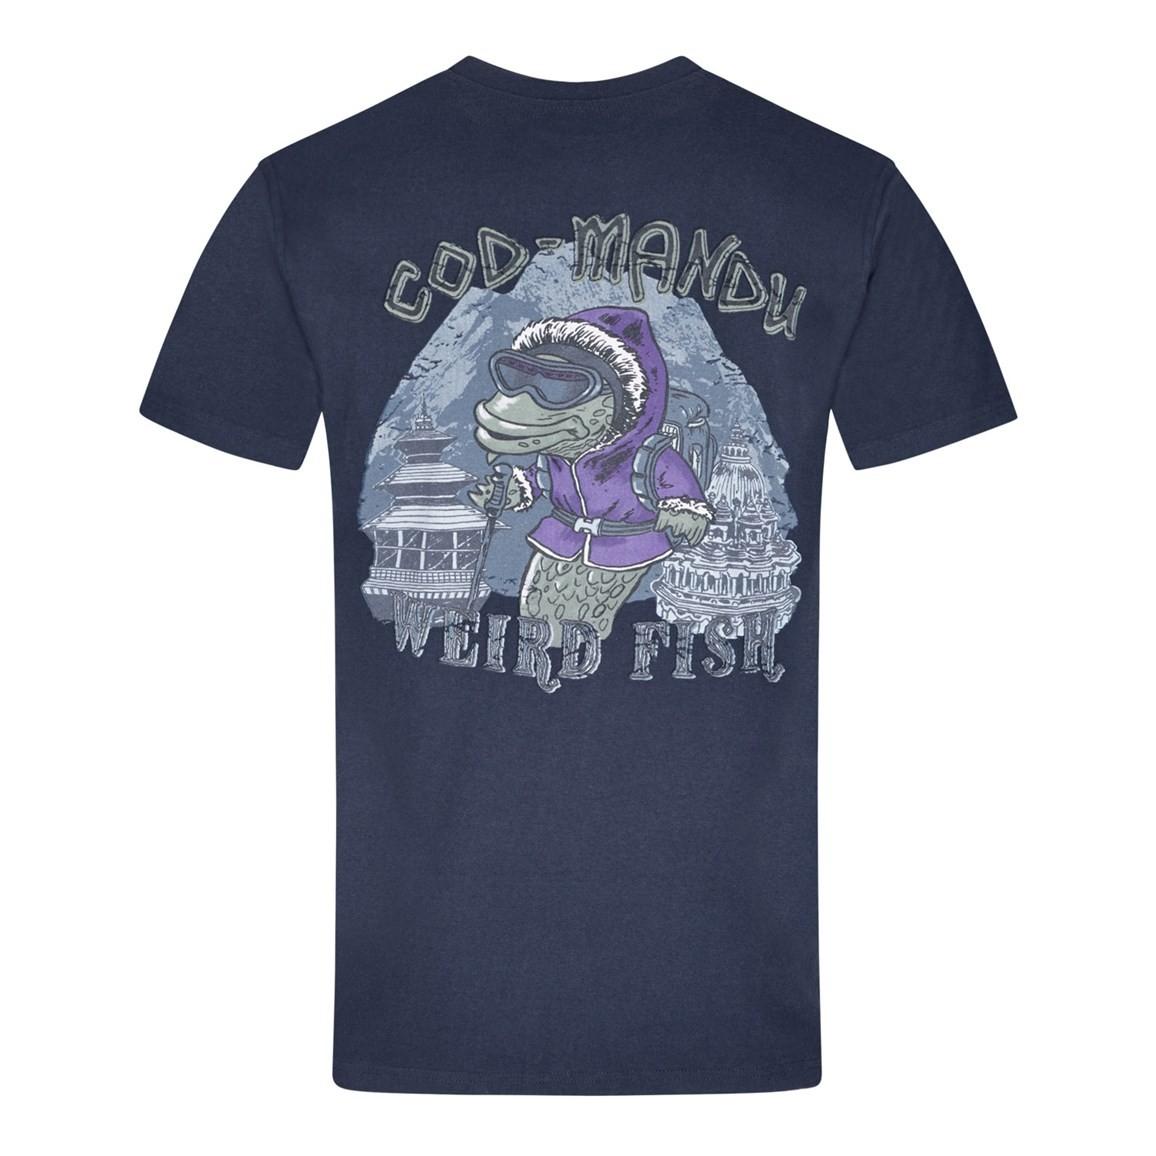 Cod Mandu Printed Artist T-Shirt Dark Navy